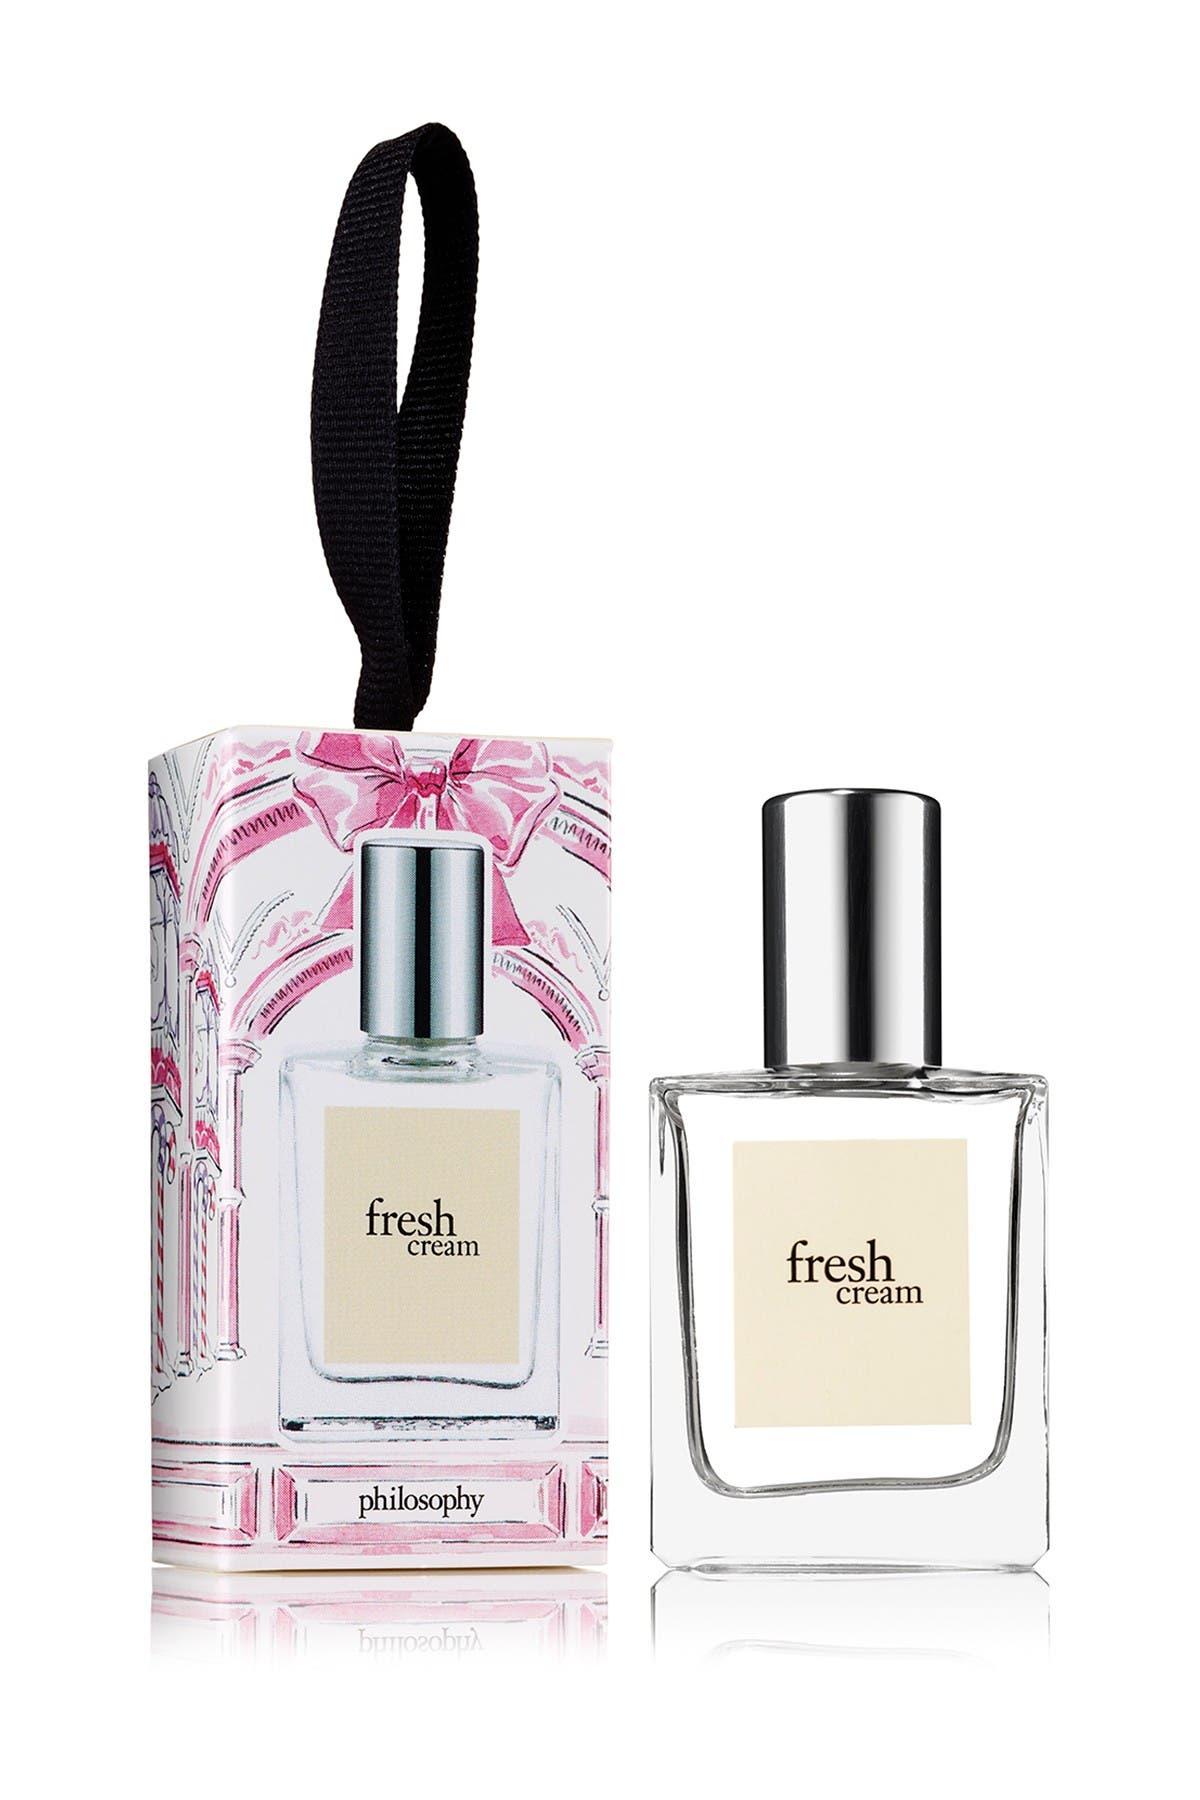 Image of philosophy fresh cream ornament - 0.5 oz.